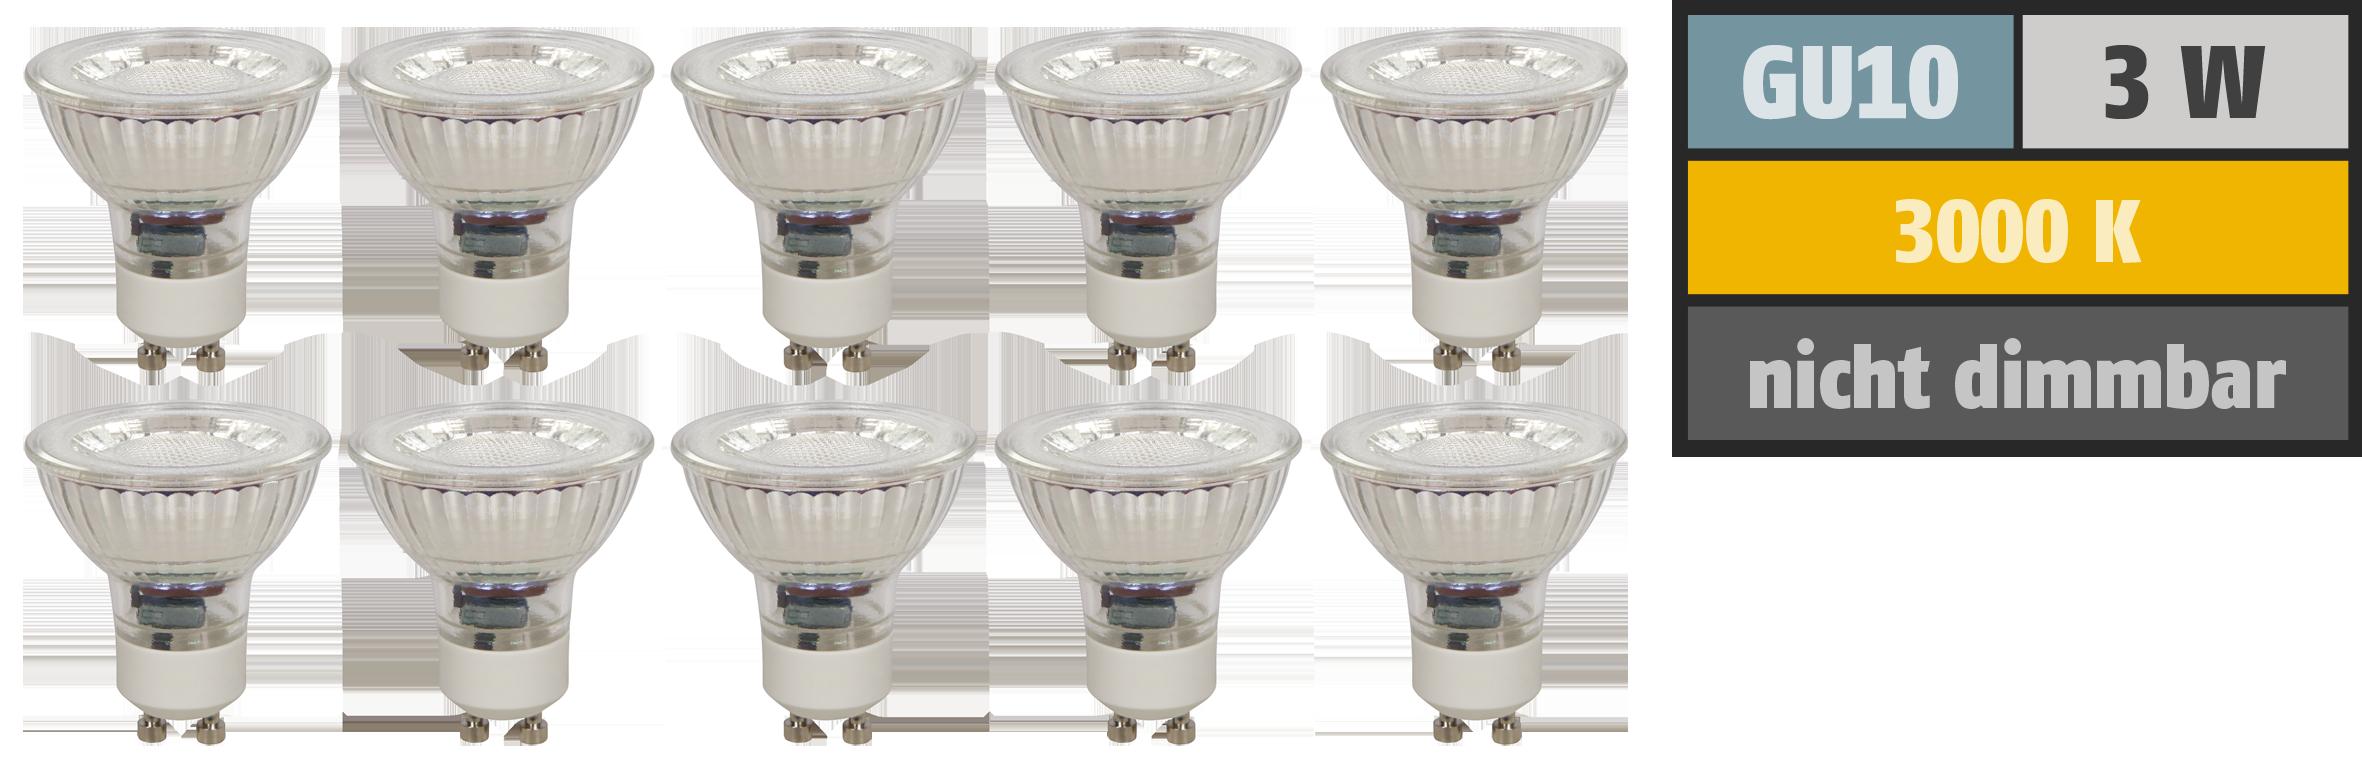 LED-Strahler McShine ''MCOB'' GU10, 3W, 250 lm, warmweiß, 10er-Pack